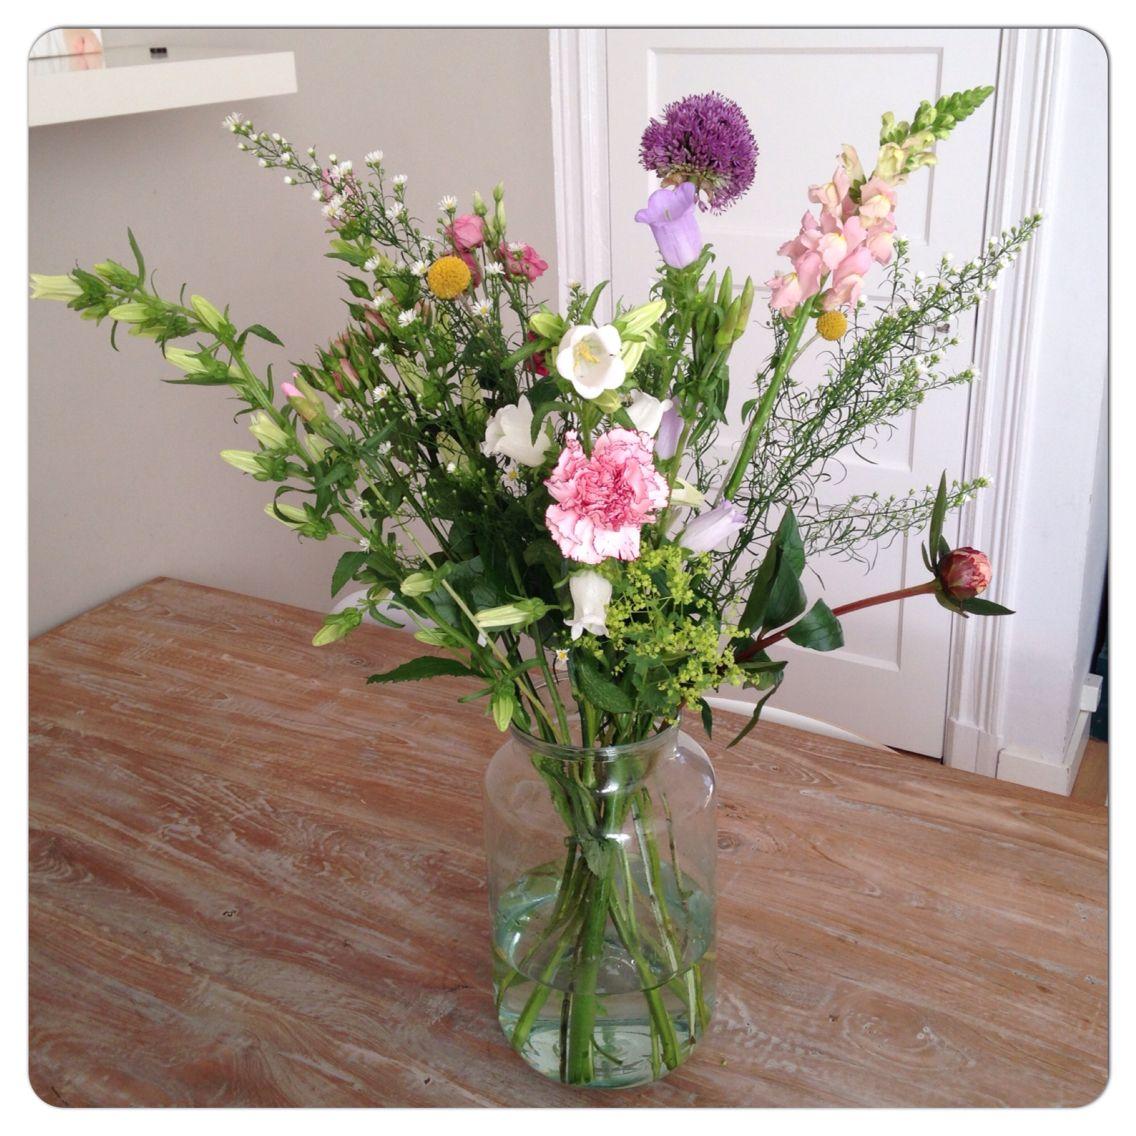 BLOOMON 4 JUNI #campanula #lysianthus #pioenroos #sierui #freesia